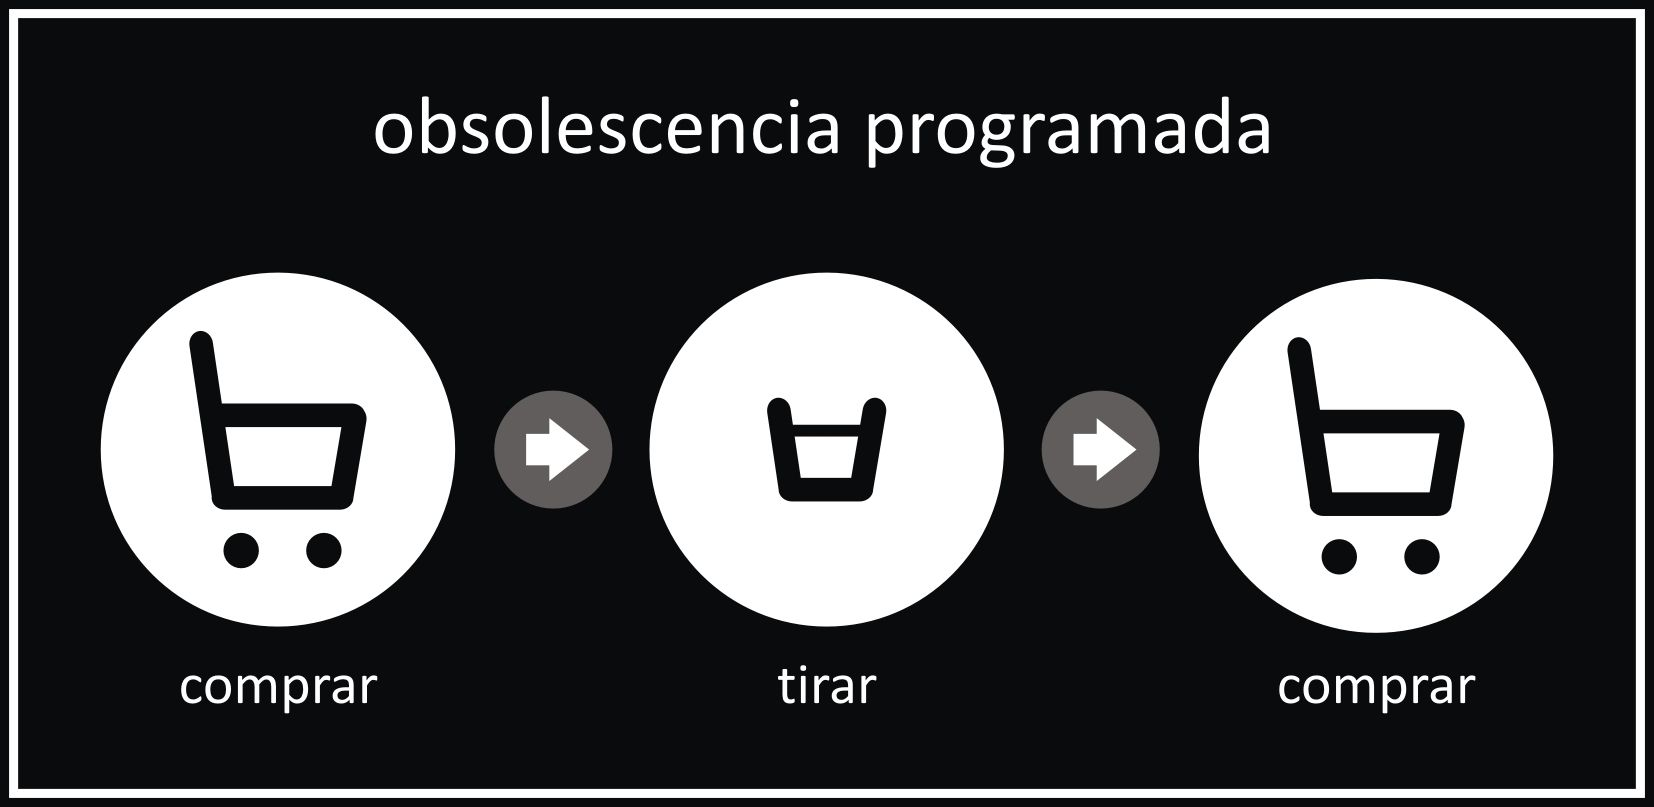 obsolescencia-programada